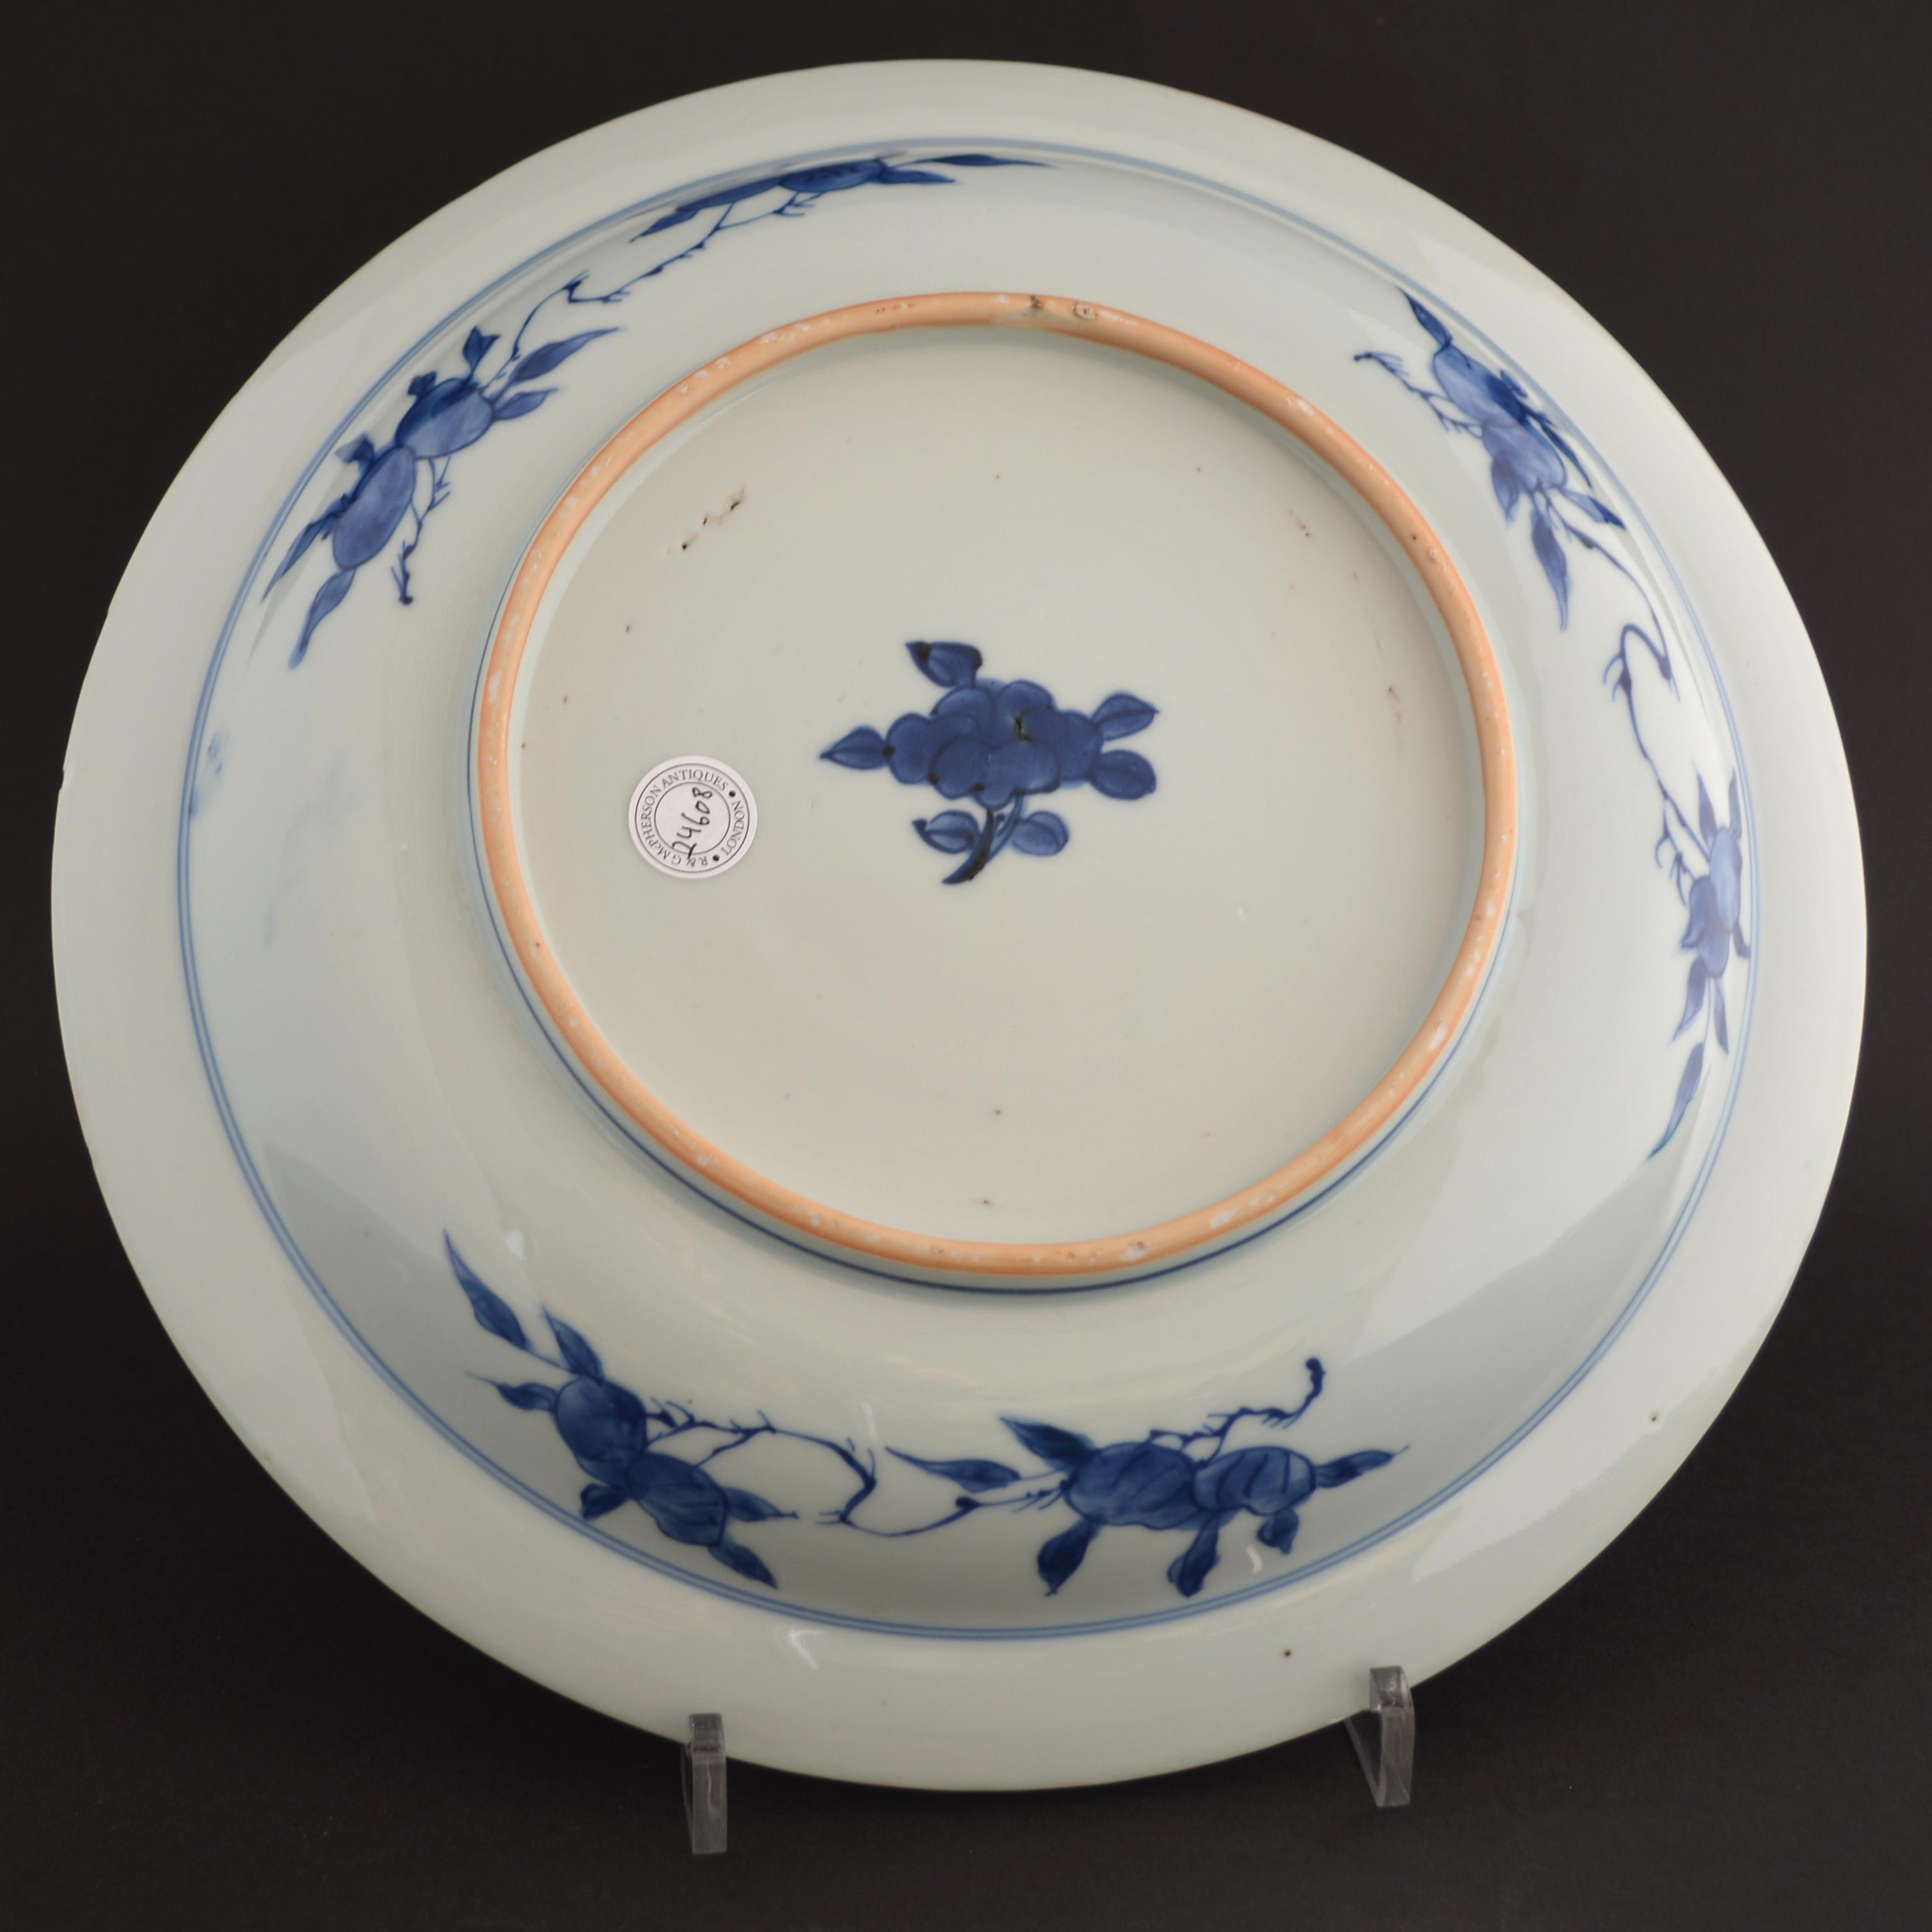 24608 Transitional Porcelain - Master of the Rocks.